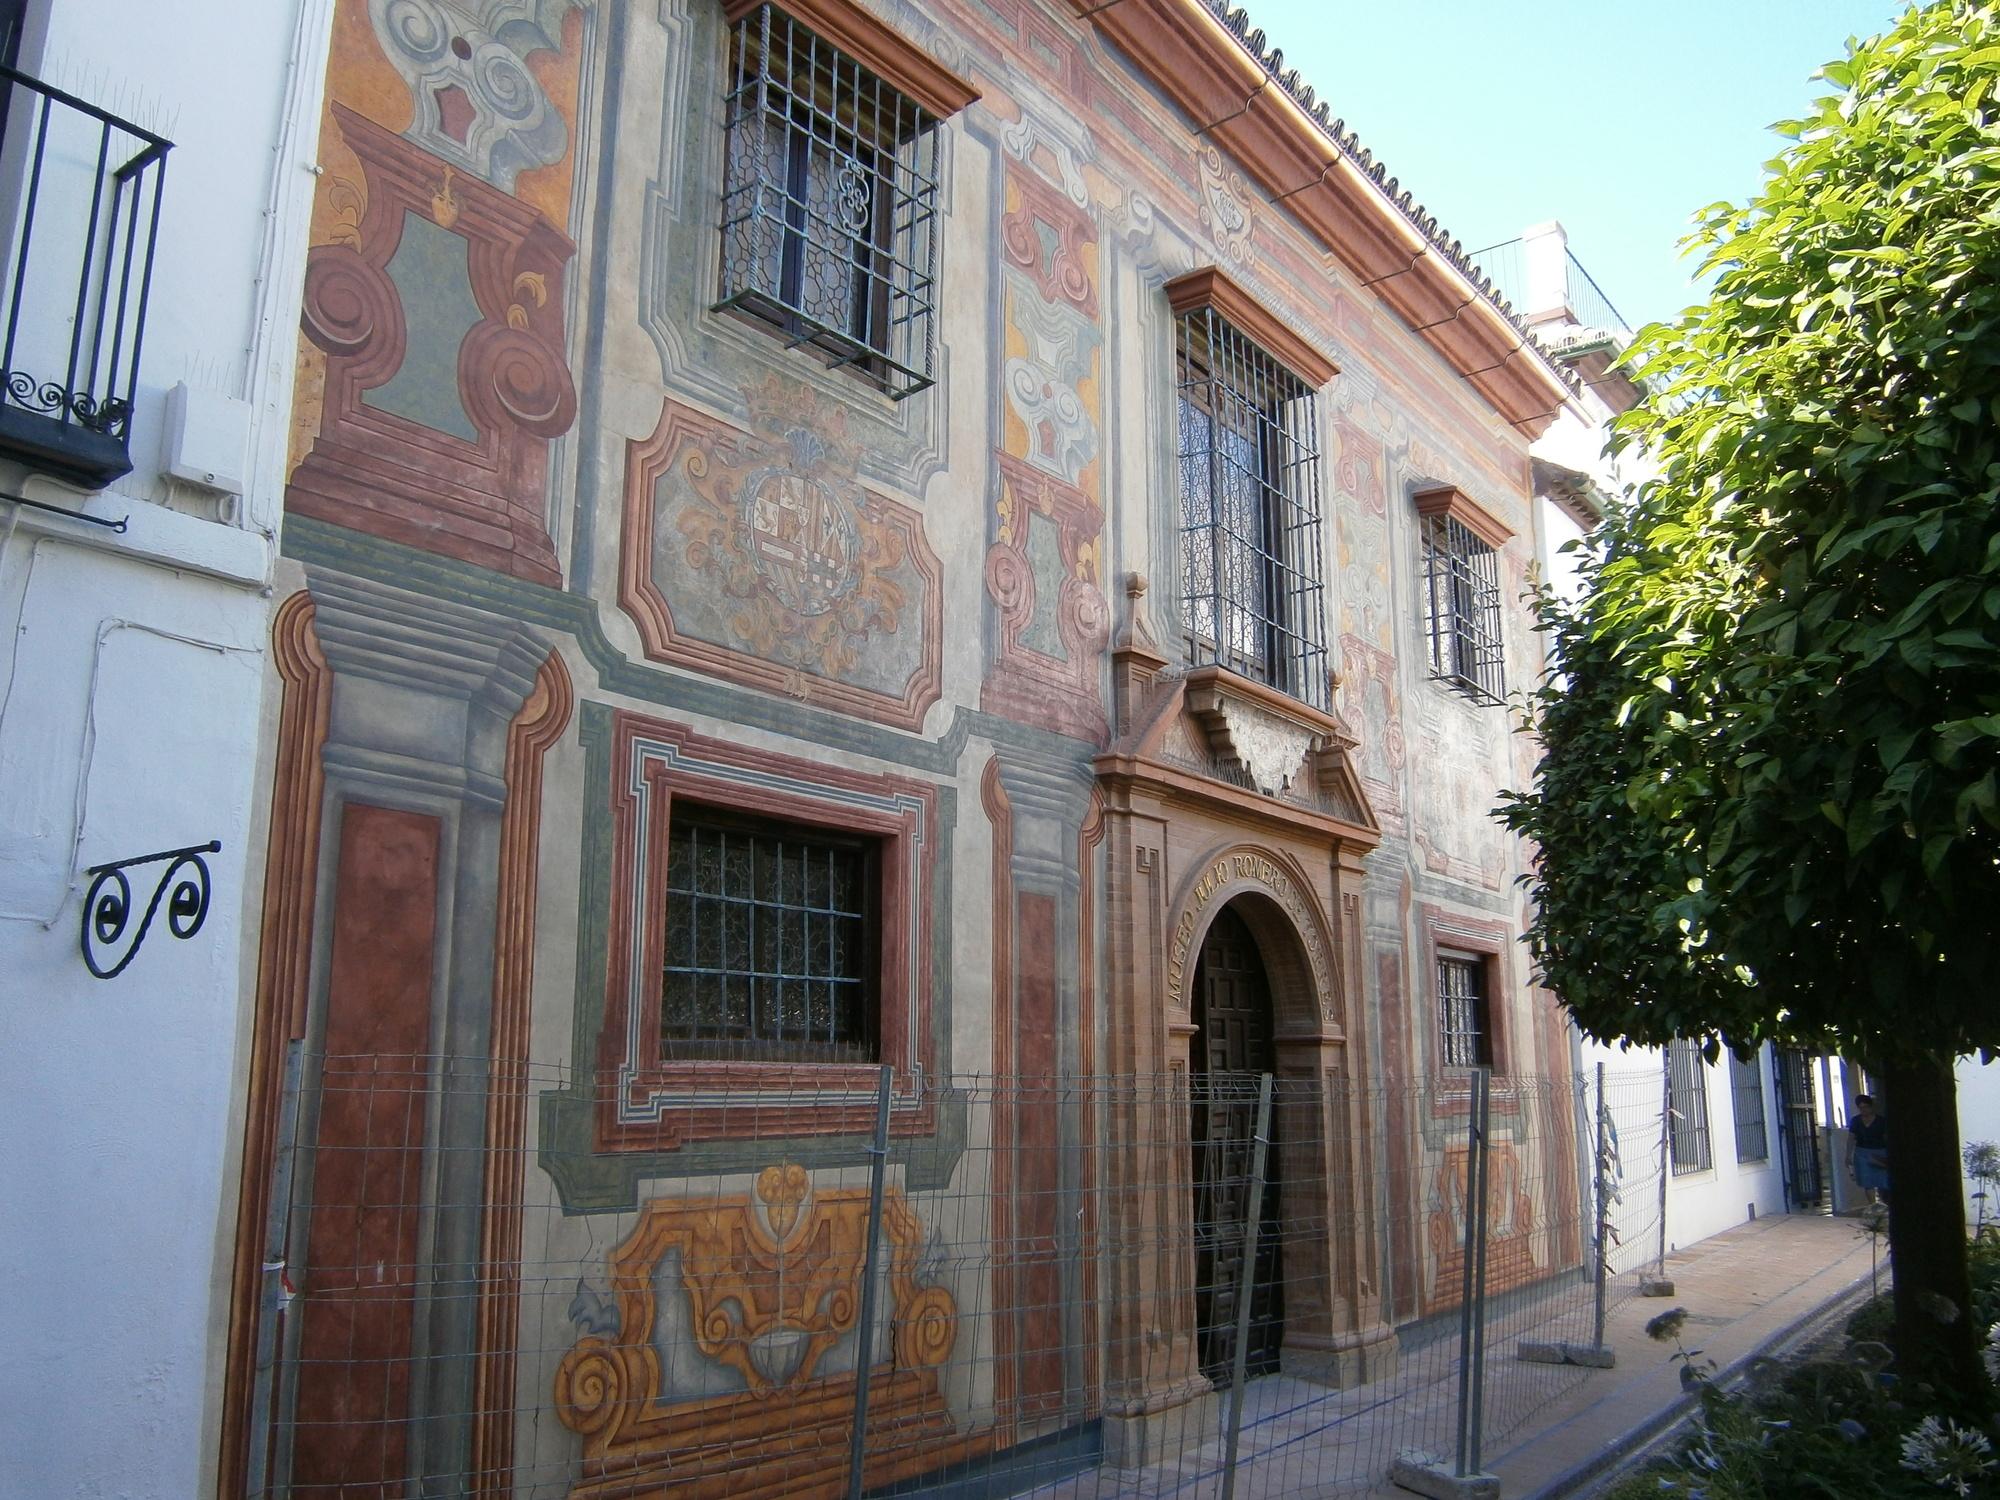 File:Museo Julio Romero de Torres 3.jpg - Wikimedia Commons